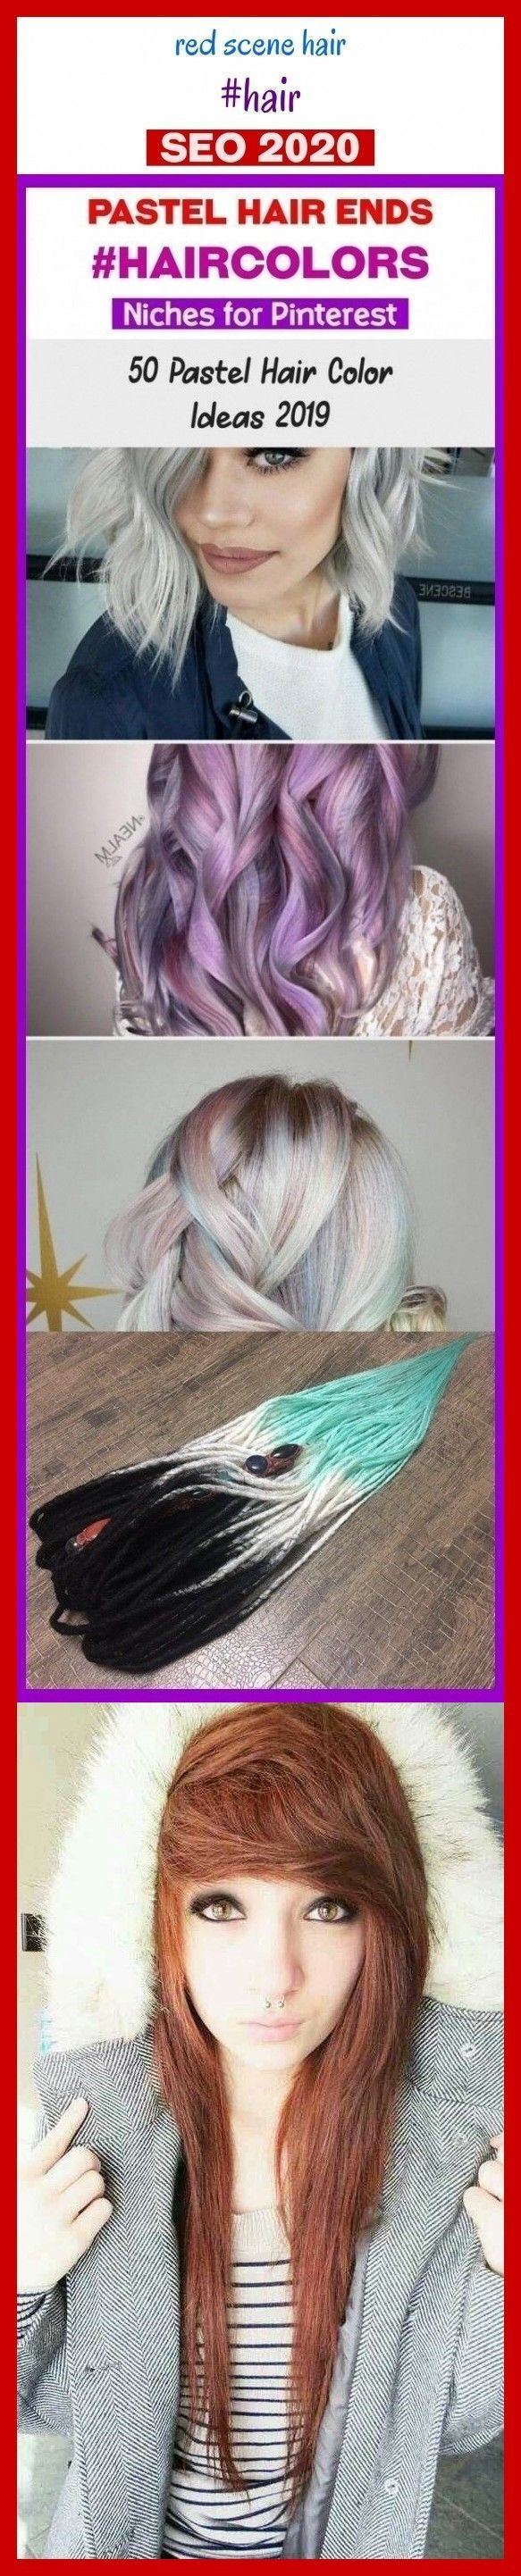 Hairstyles  #black #scene black scene hair, scene hair medium choppy, scene hair… - Popular